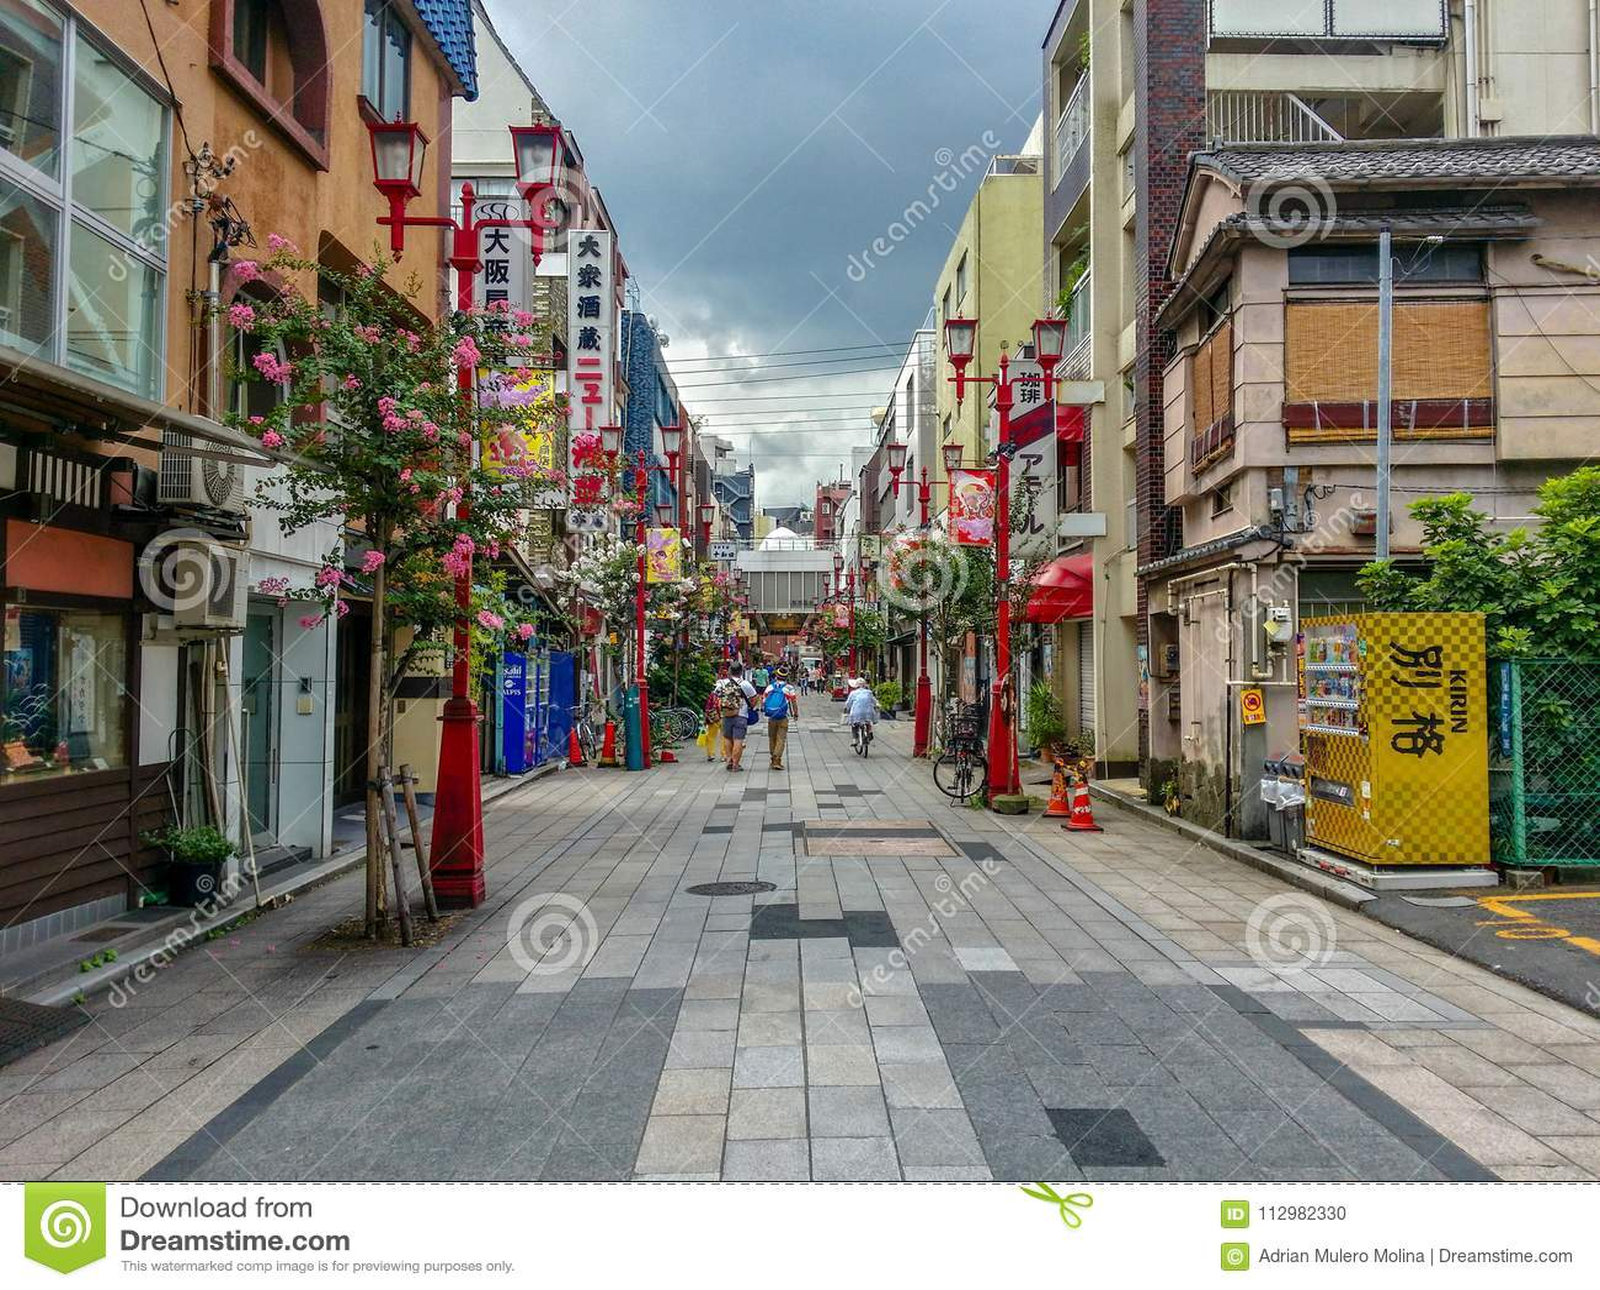 View of Asakusa street in tokyo in summer season.